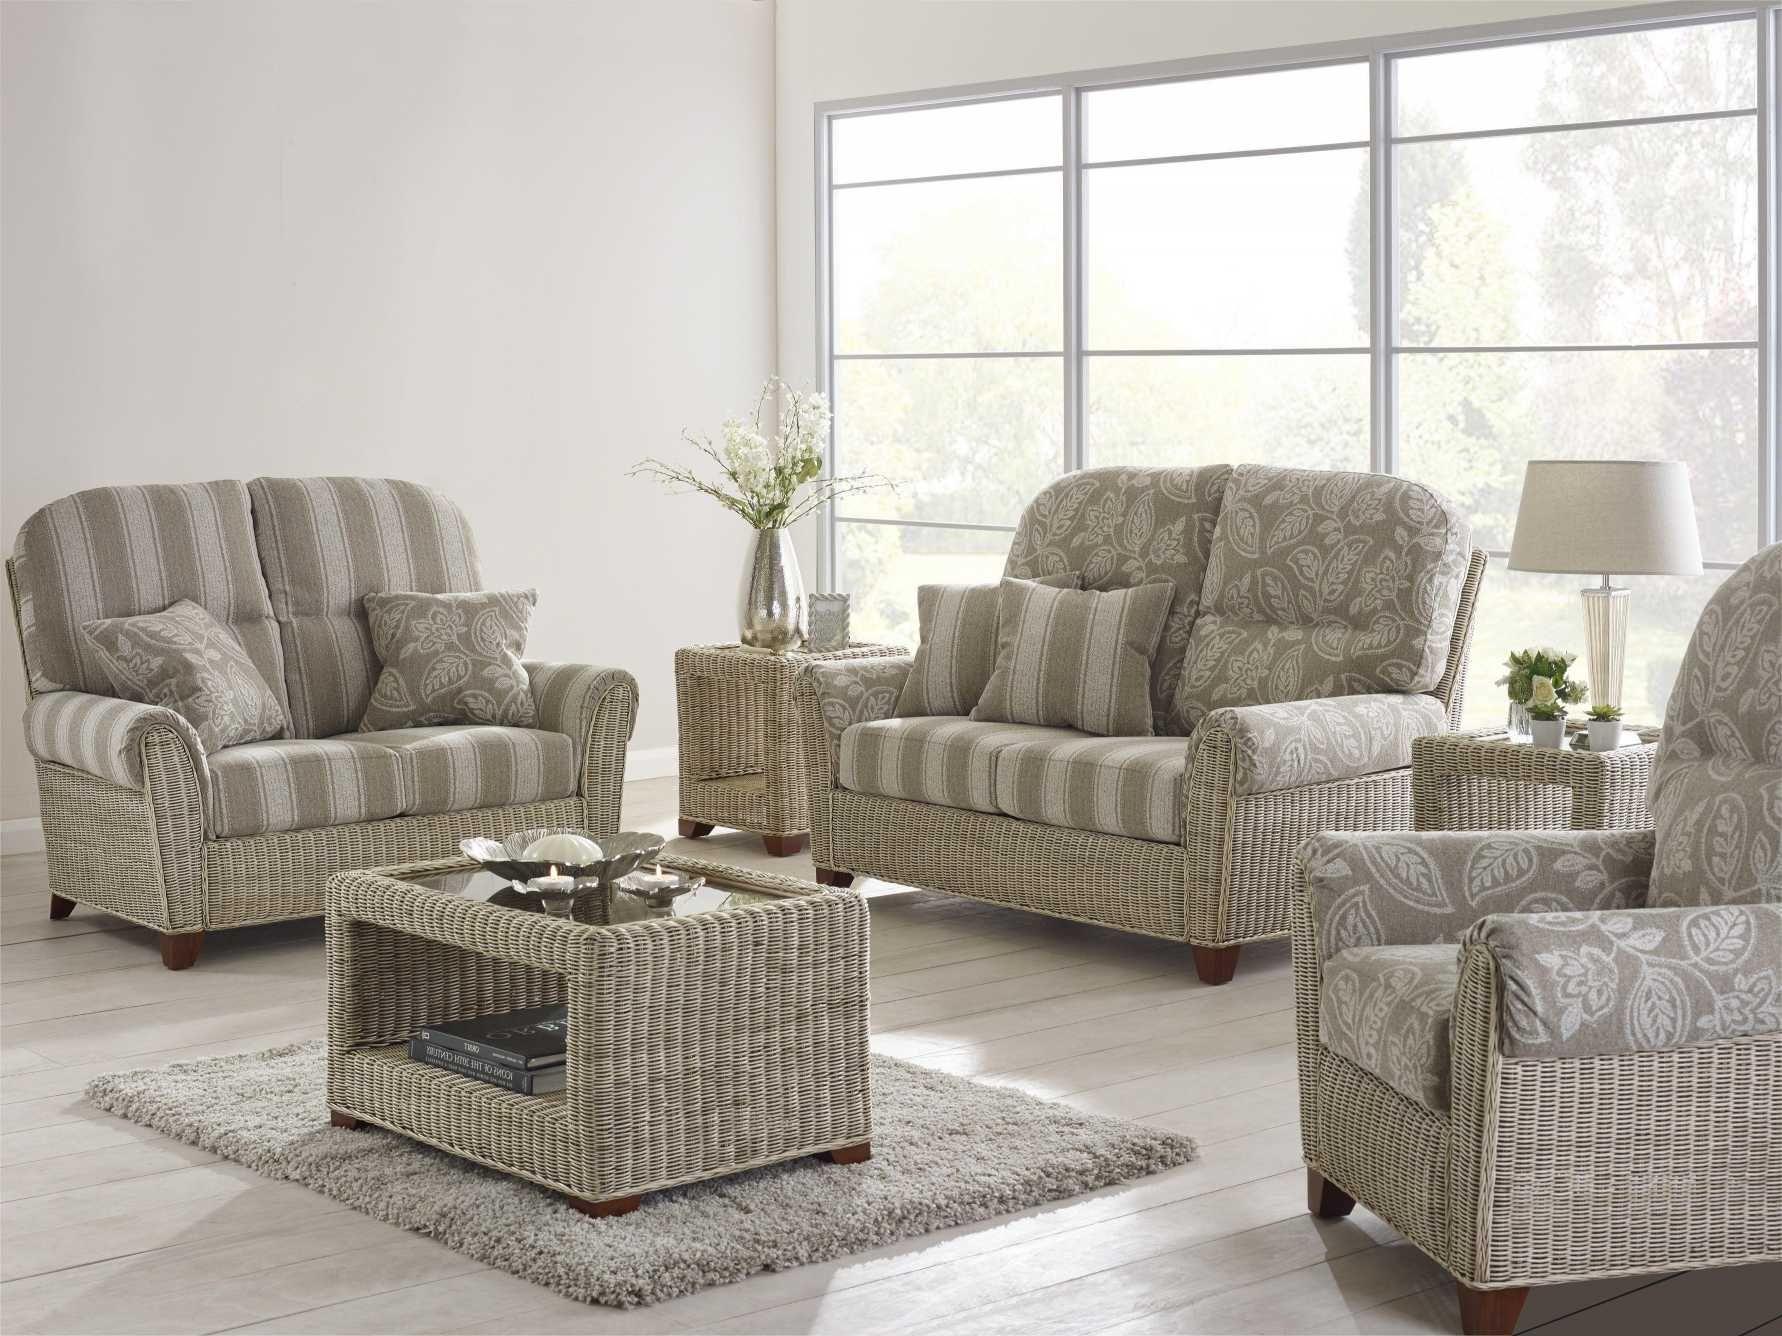 Living Room Furniture Sale Luxury Furniture Loveseat Outdoor New